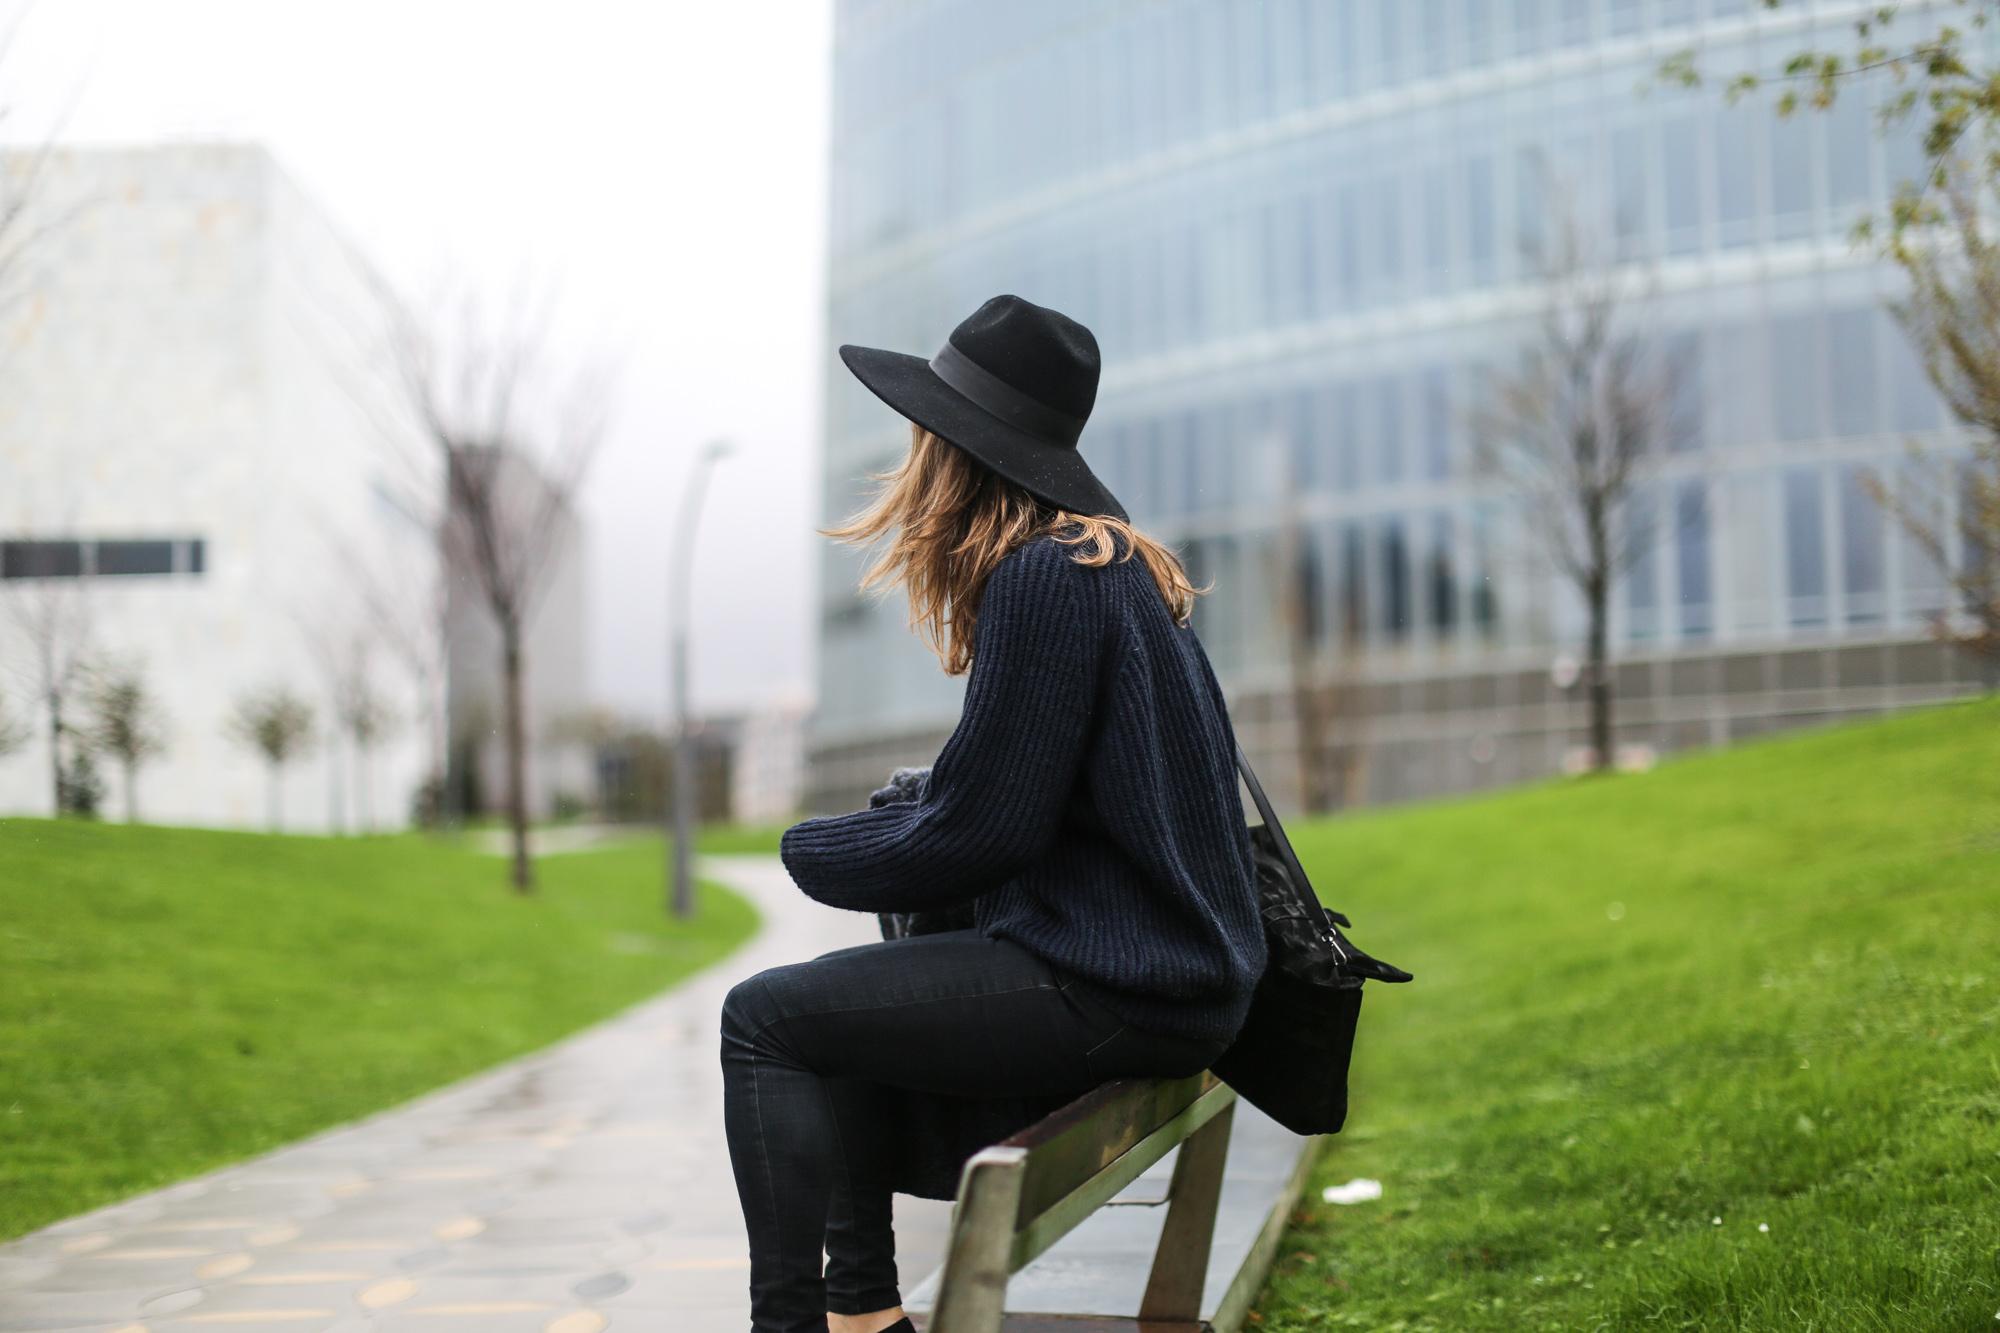 Clochet-streetstyle-mango-jacket-fedora-hat-kitten-heels-8